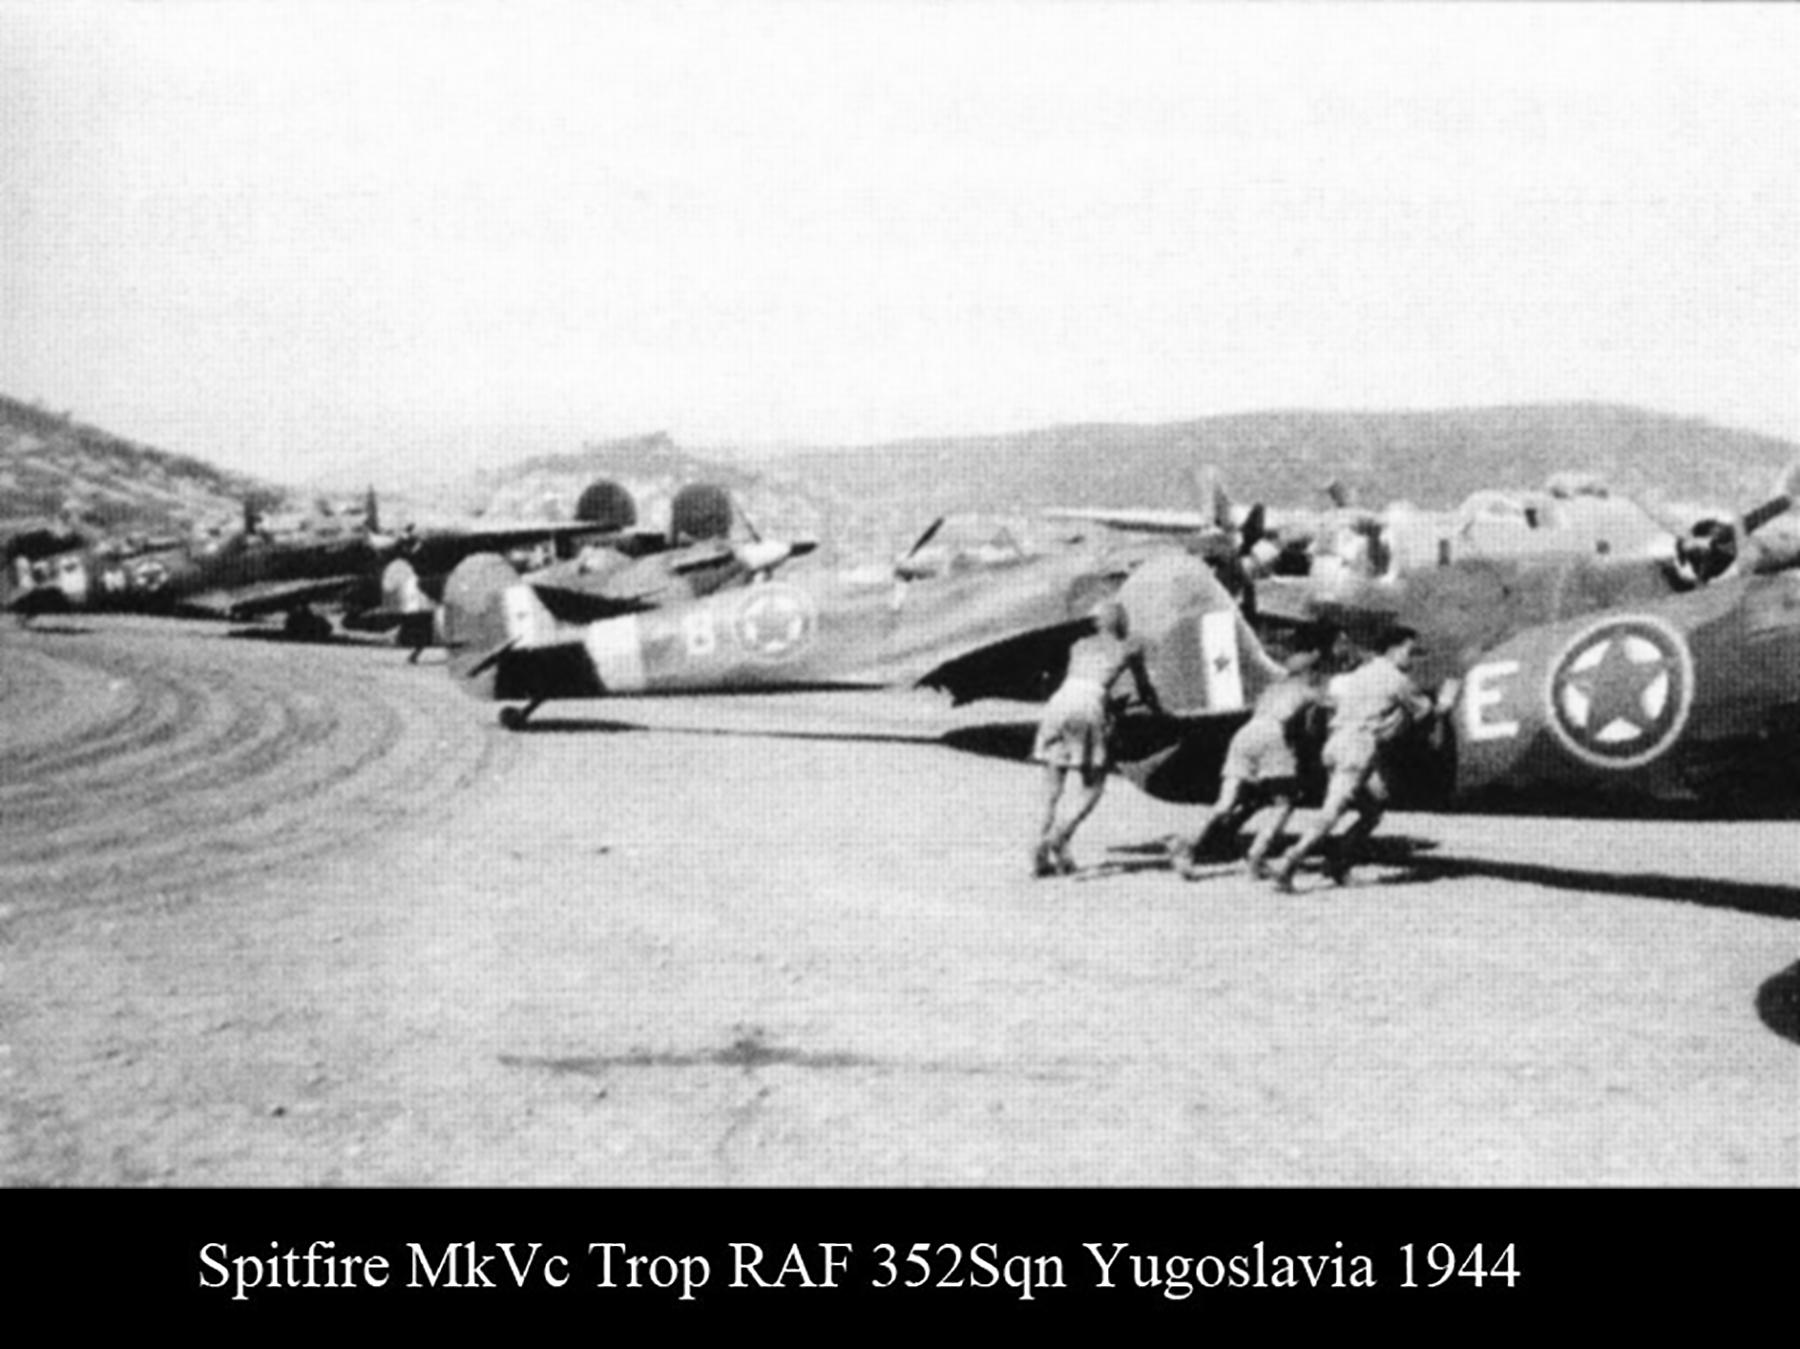 Spitfire MkVcTrop RAF 352Sqn Yugoslavia 1944 01